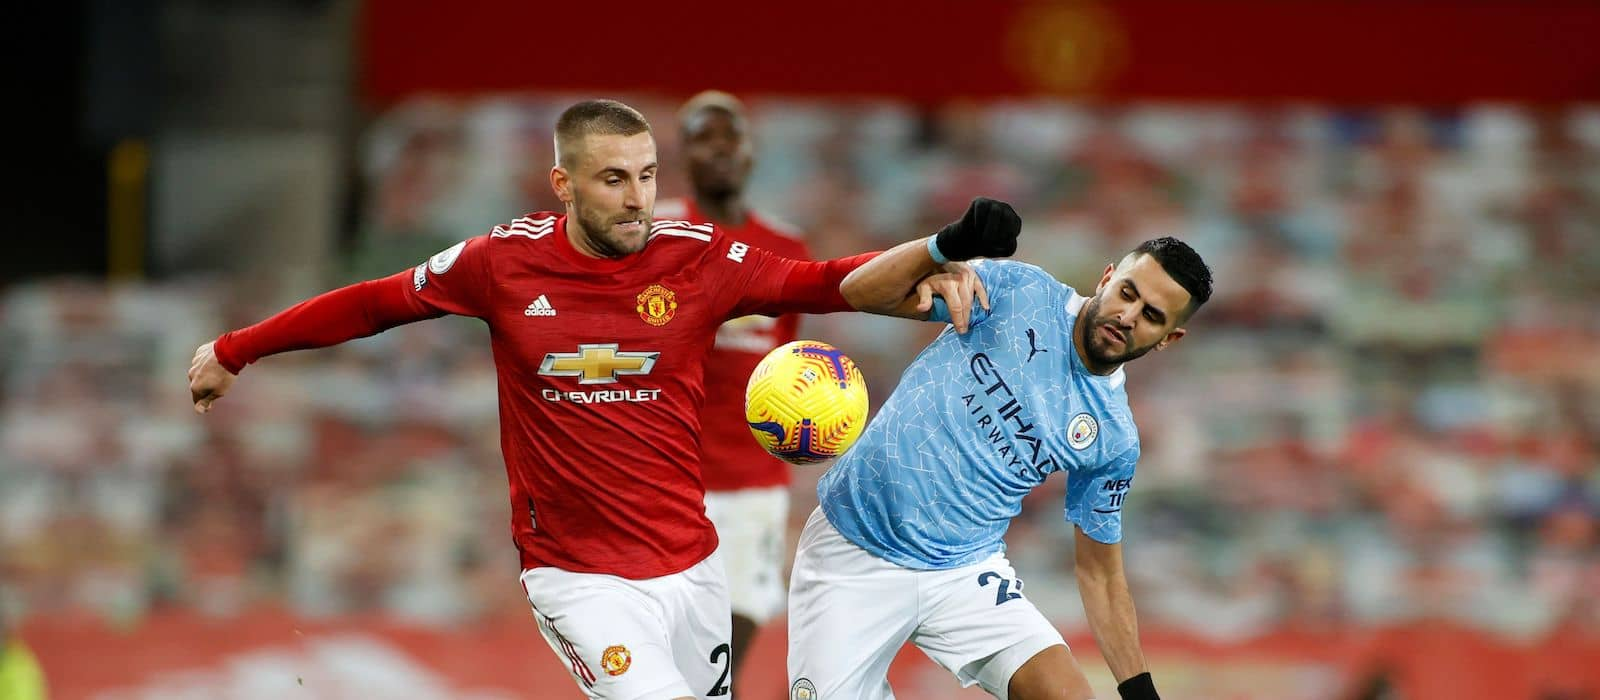 Luke Shaw dominates in drab draw vs Manchester City